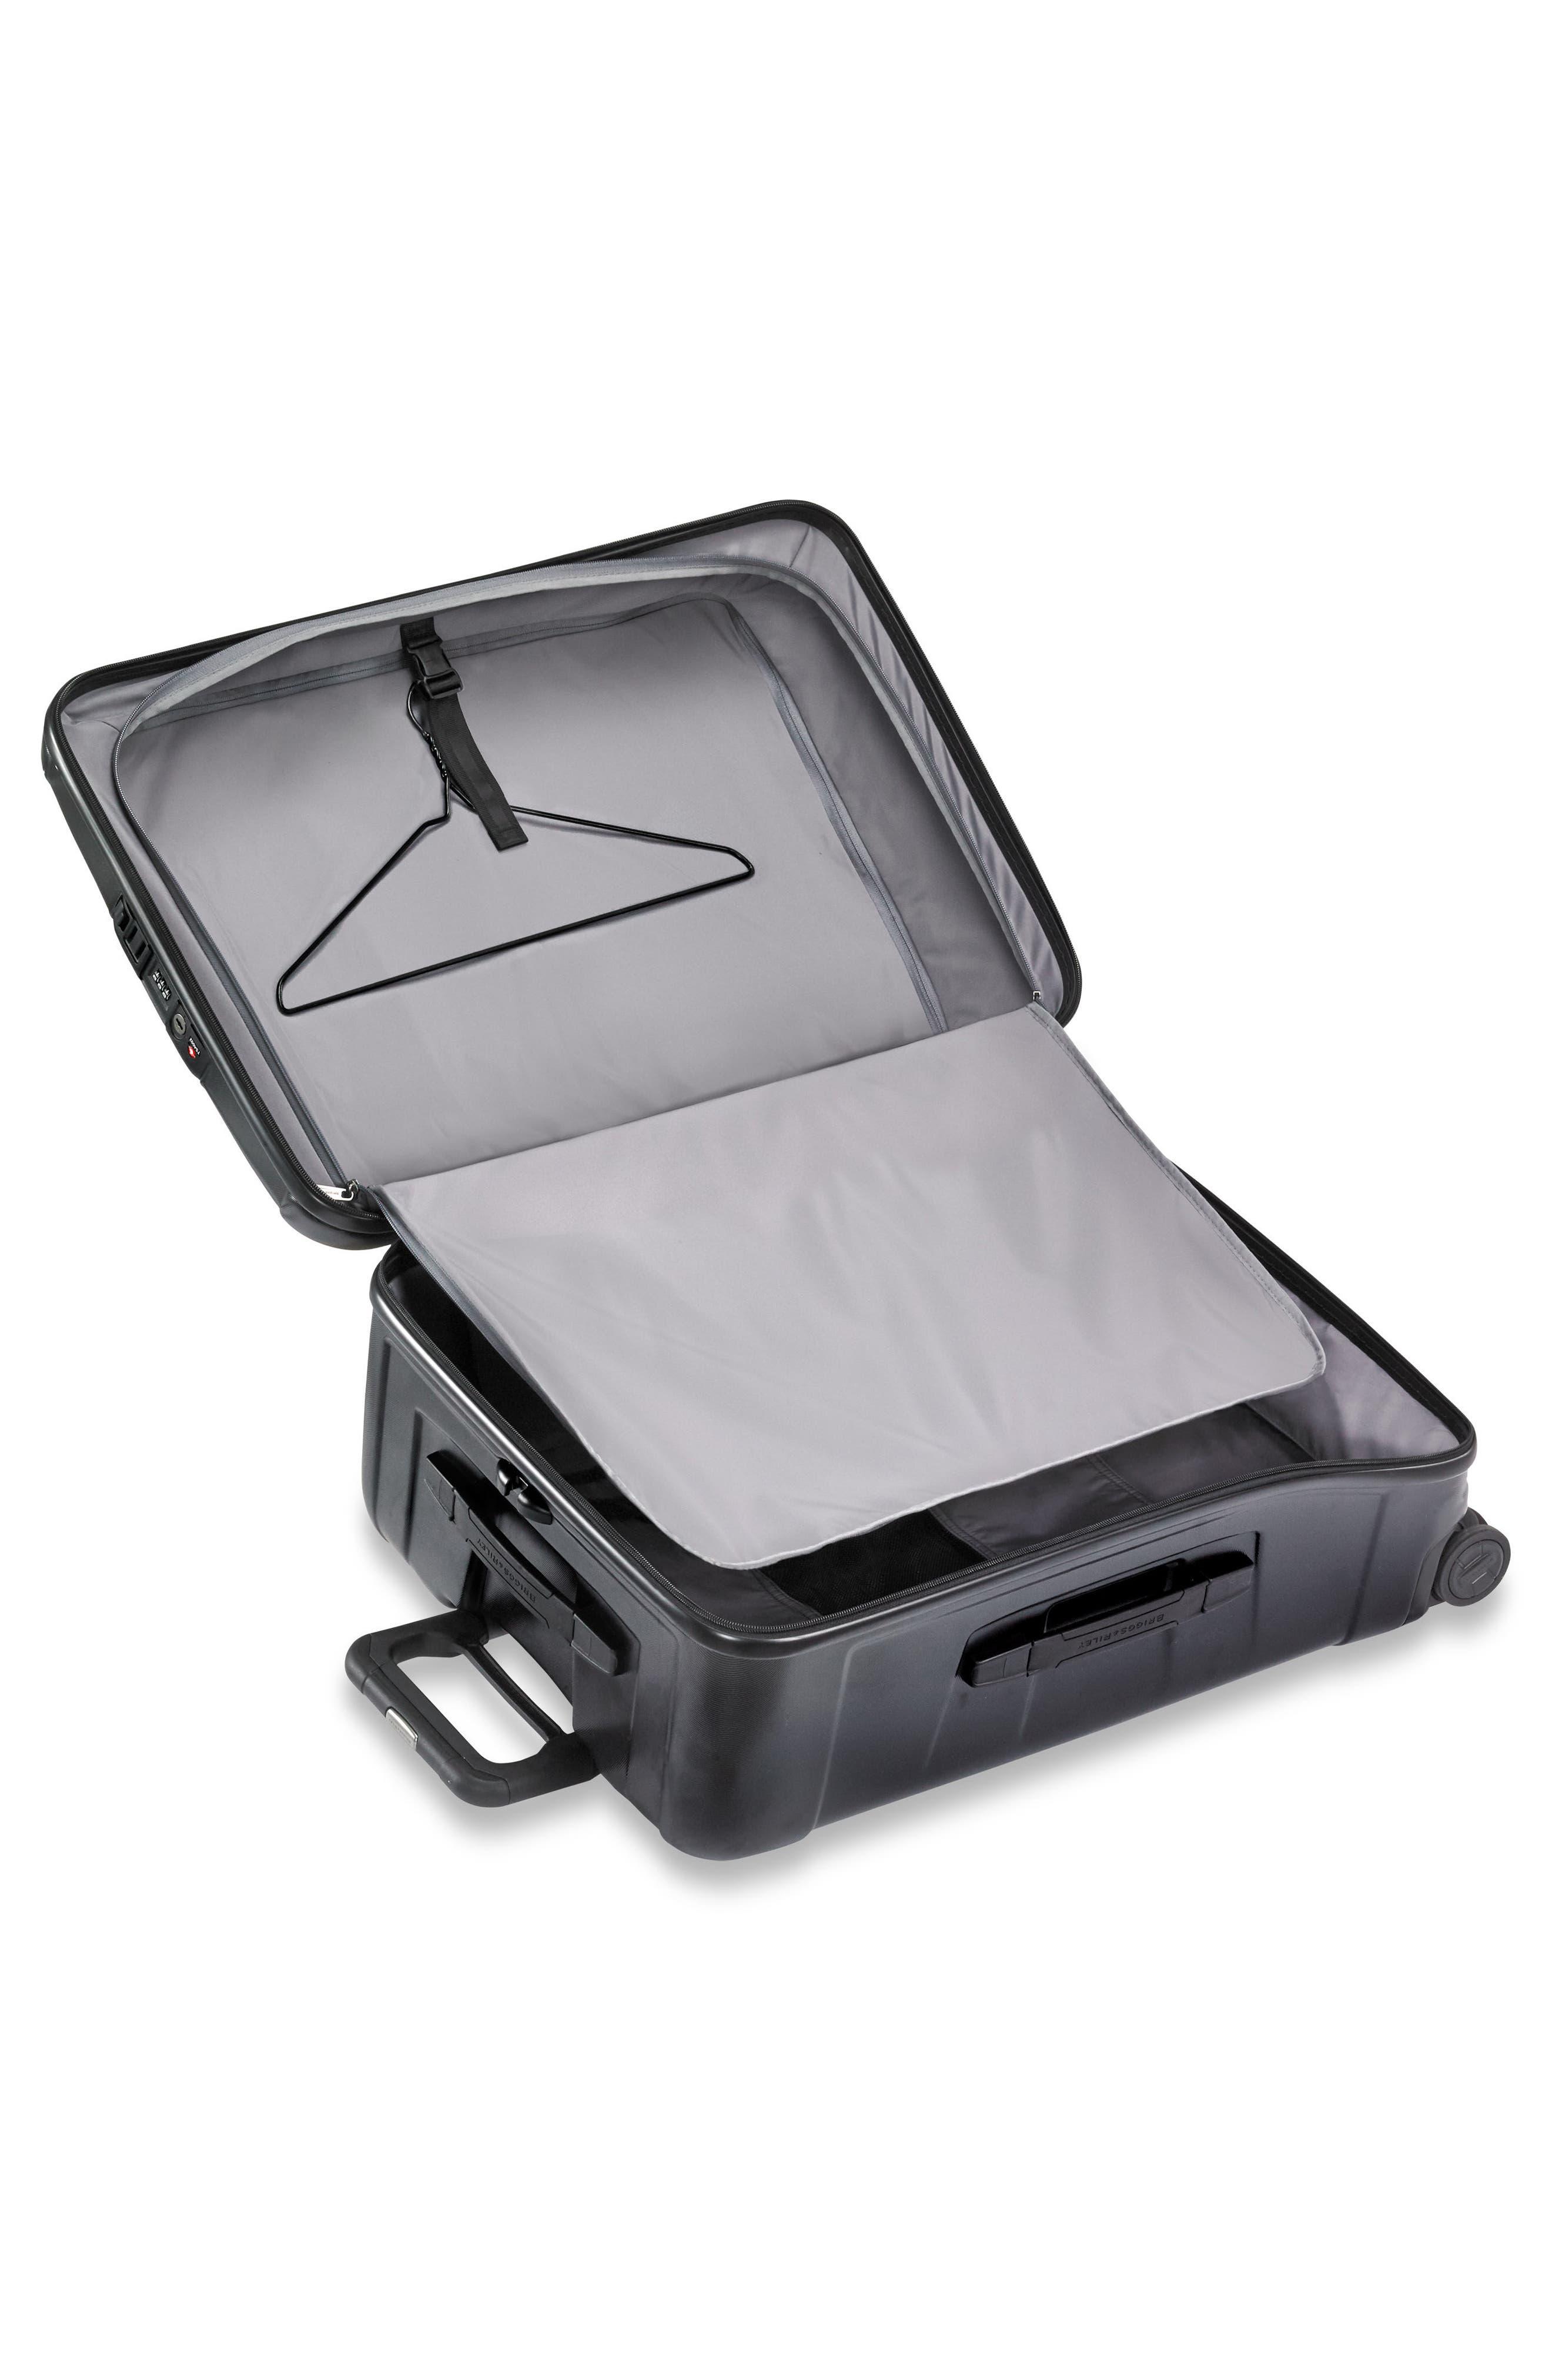 Alternate Image 3  - Briggs & Riley Torq Medium Wheeled Packing Case